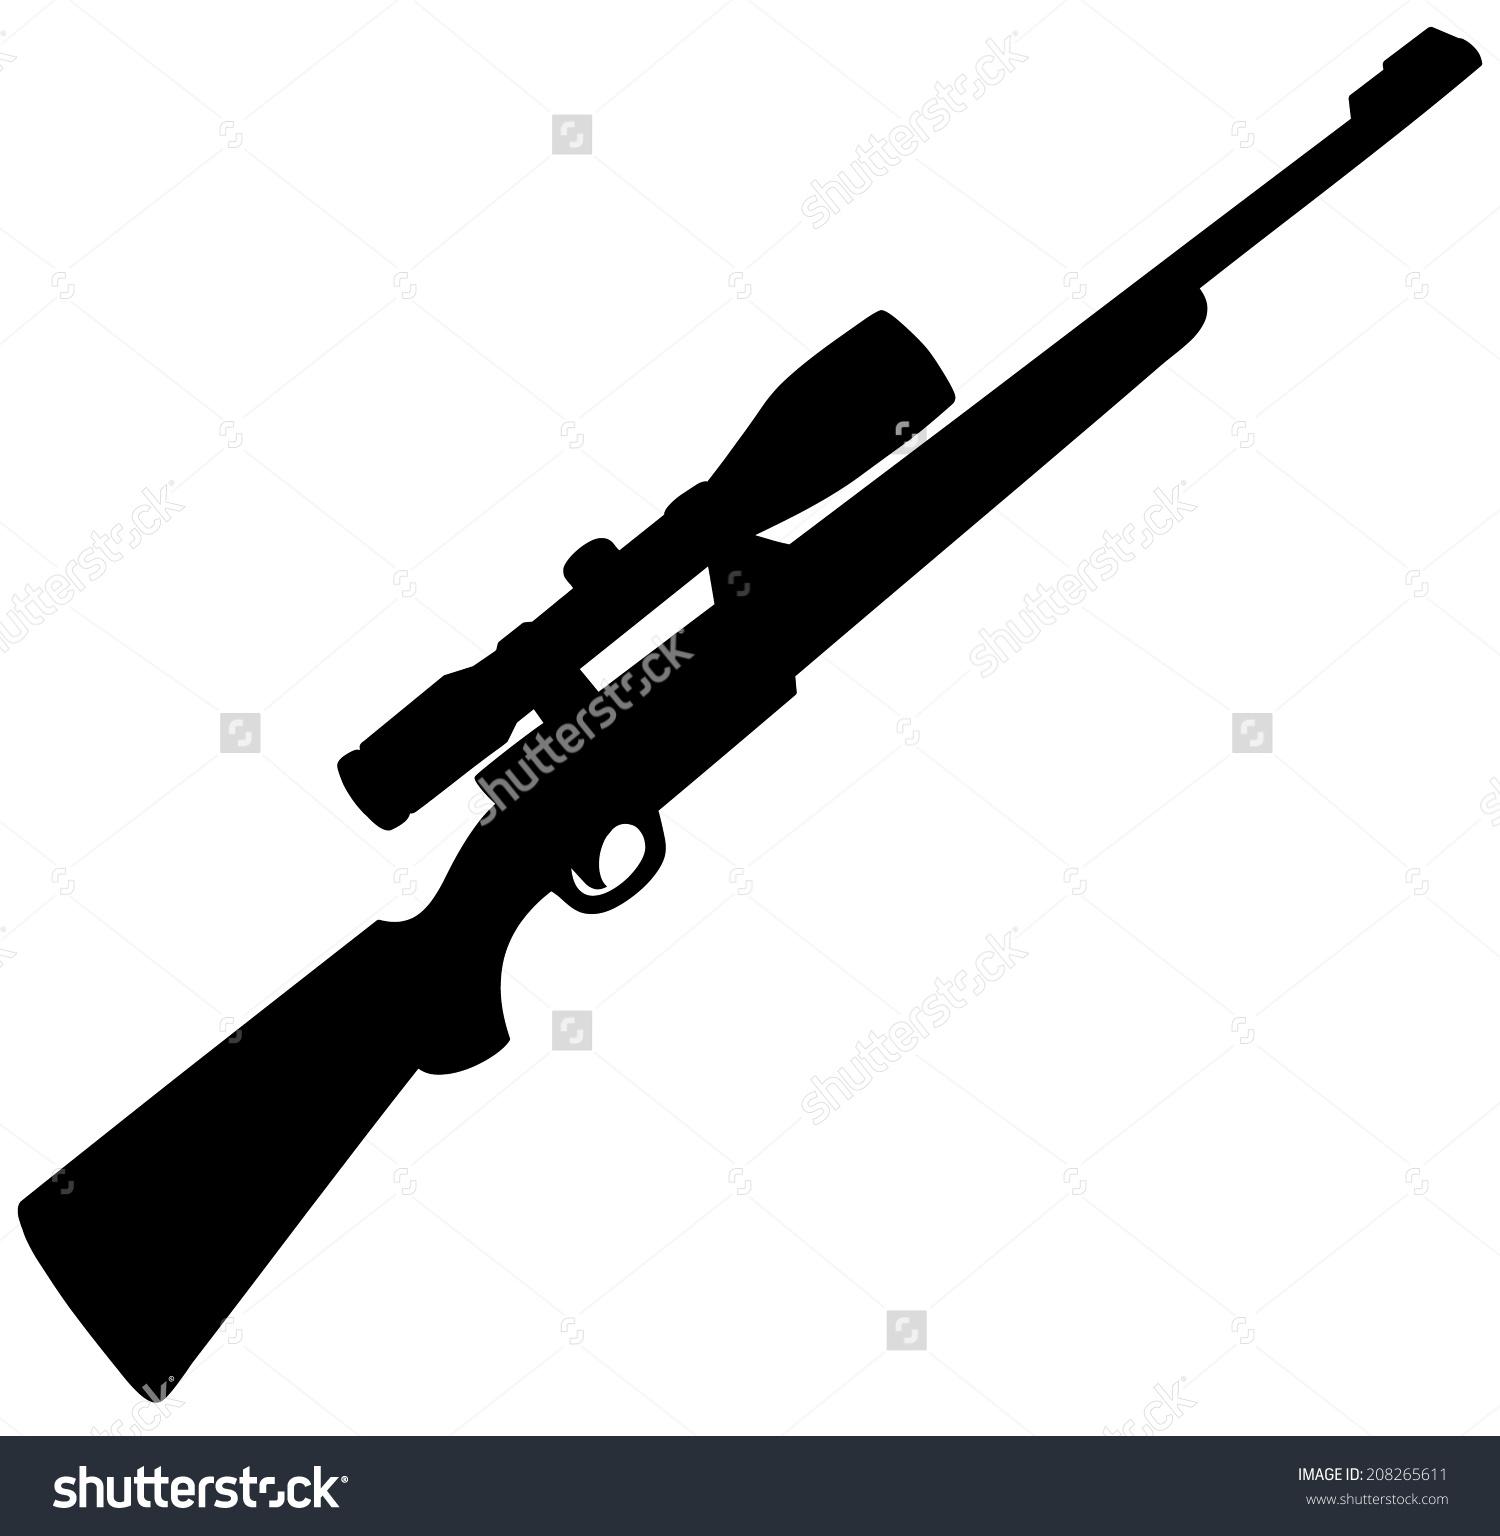 Free rifle cliparts download. Clipart gun hunting gun